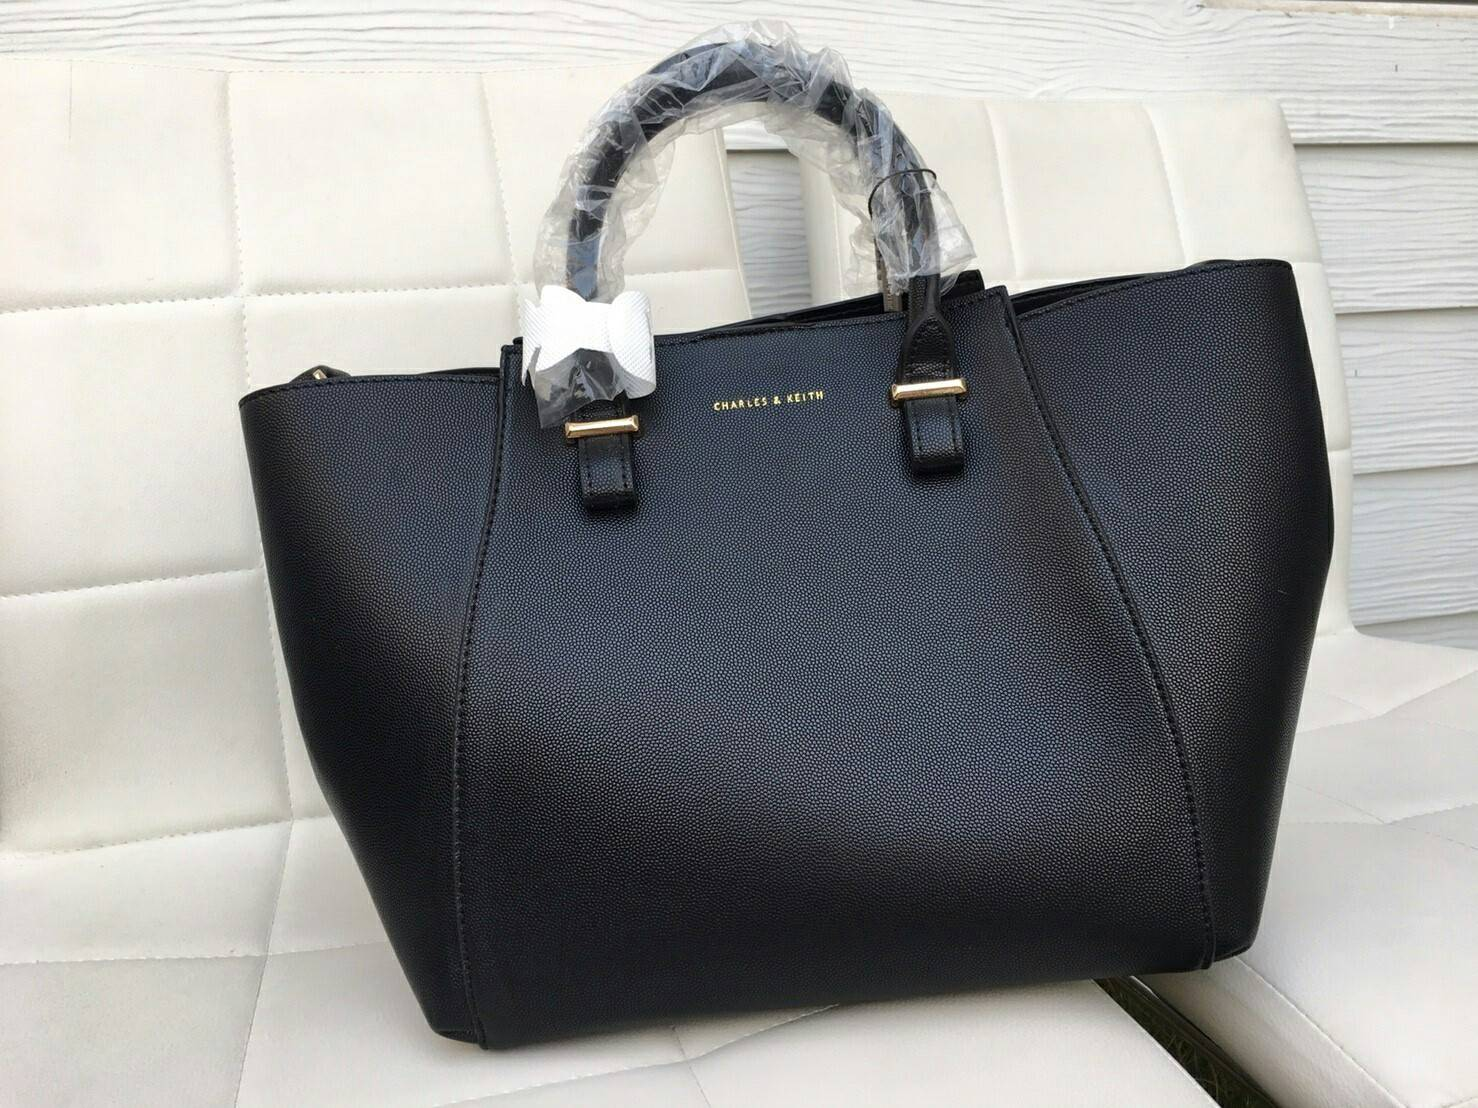 CHARLES & KEITH กระเป๋าทรงสวย รุ่นนี้มีกระเป๋าใบเล็ก แยกถือได้มาให้ด้วยนะค่ะ